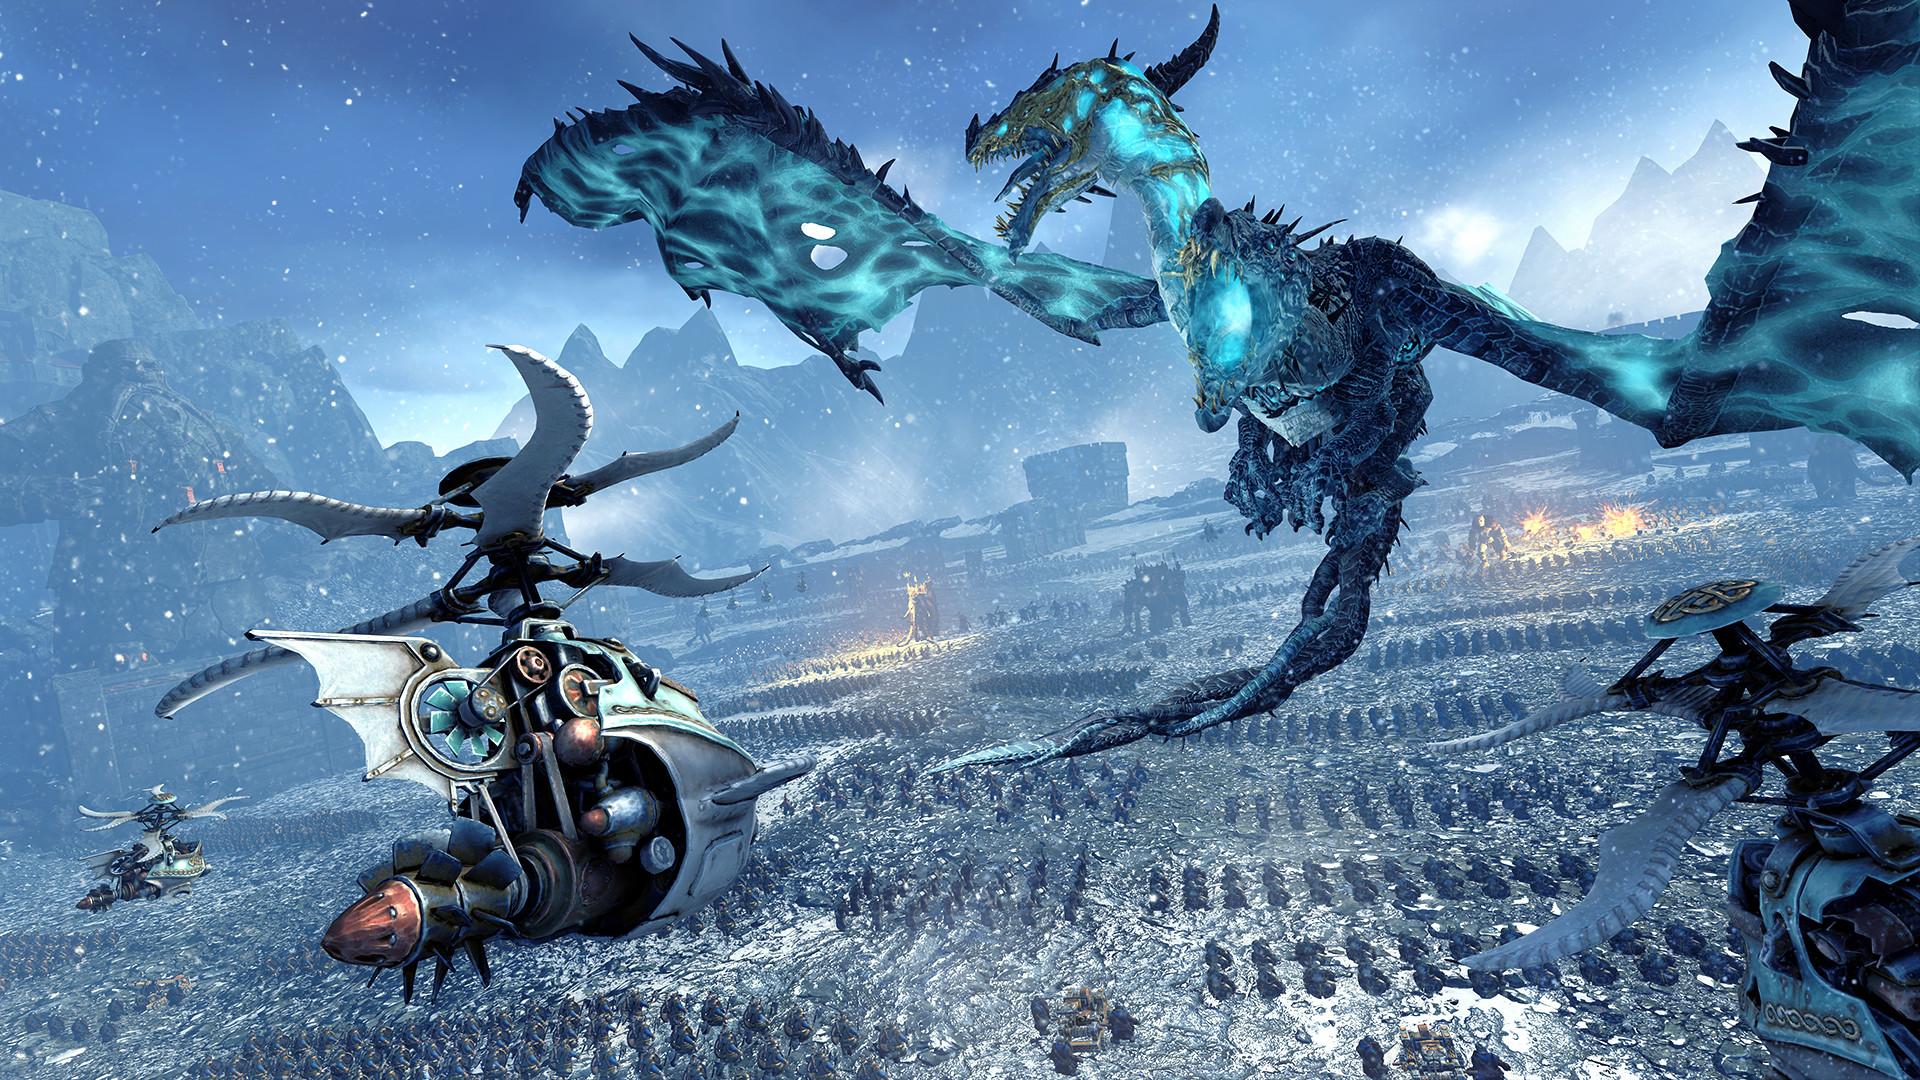 Total War WARHAMMER Norsca torrent download - Steam DLC RePack